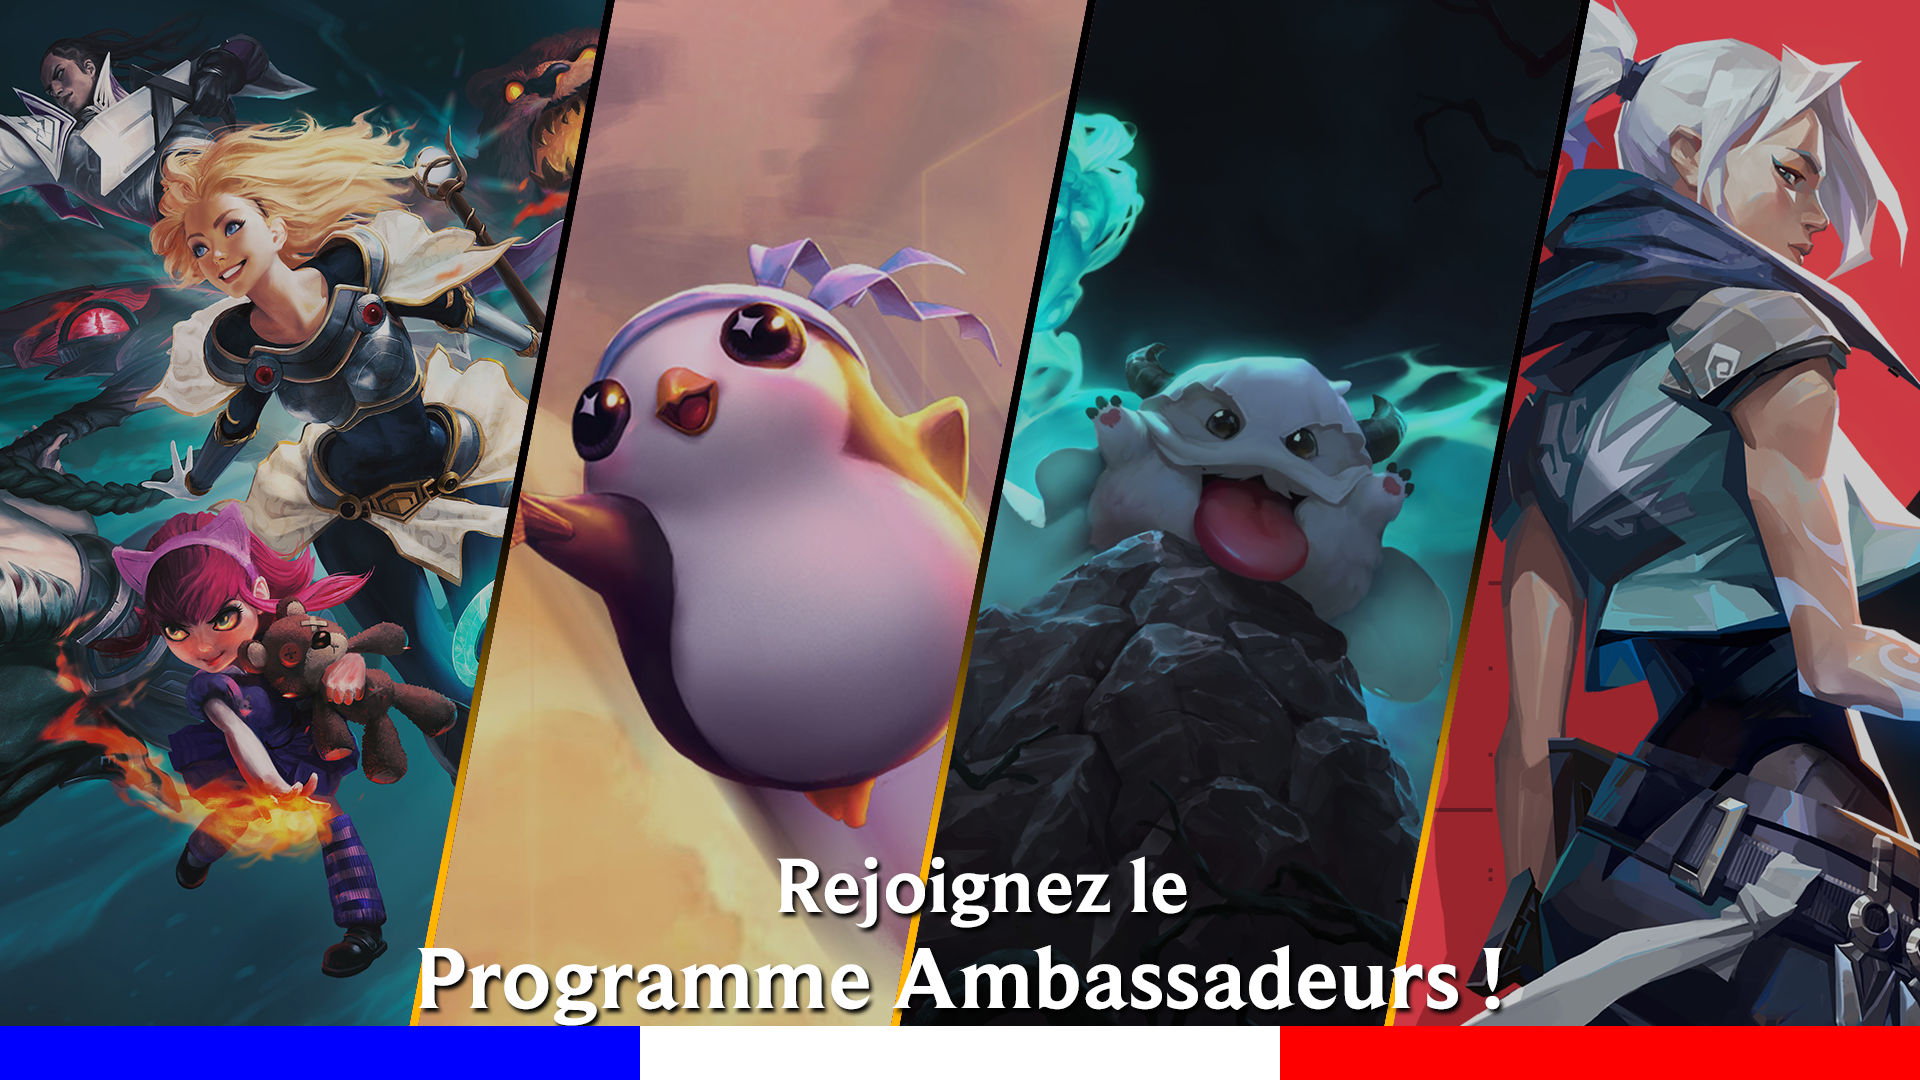 Programme ambassadeur riot games